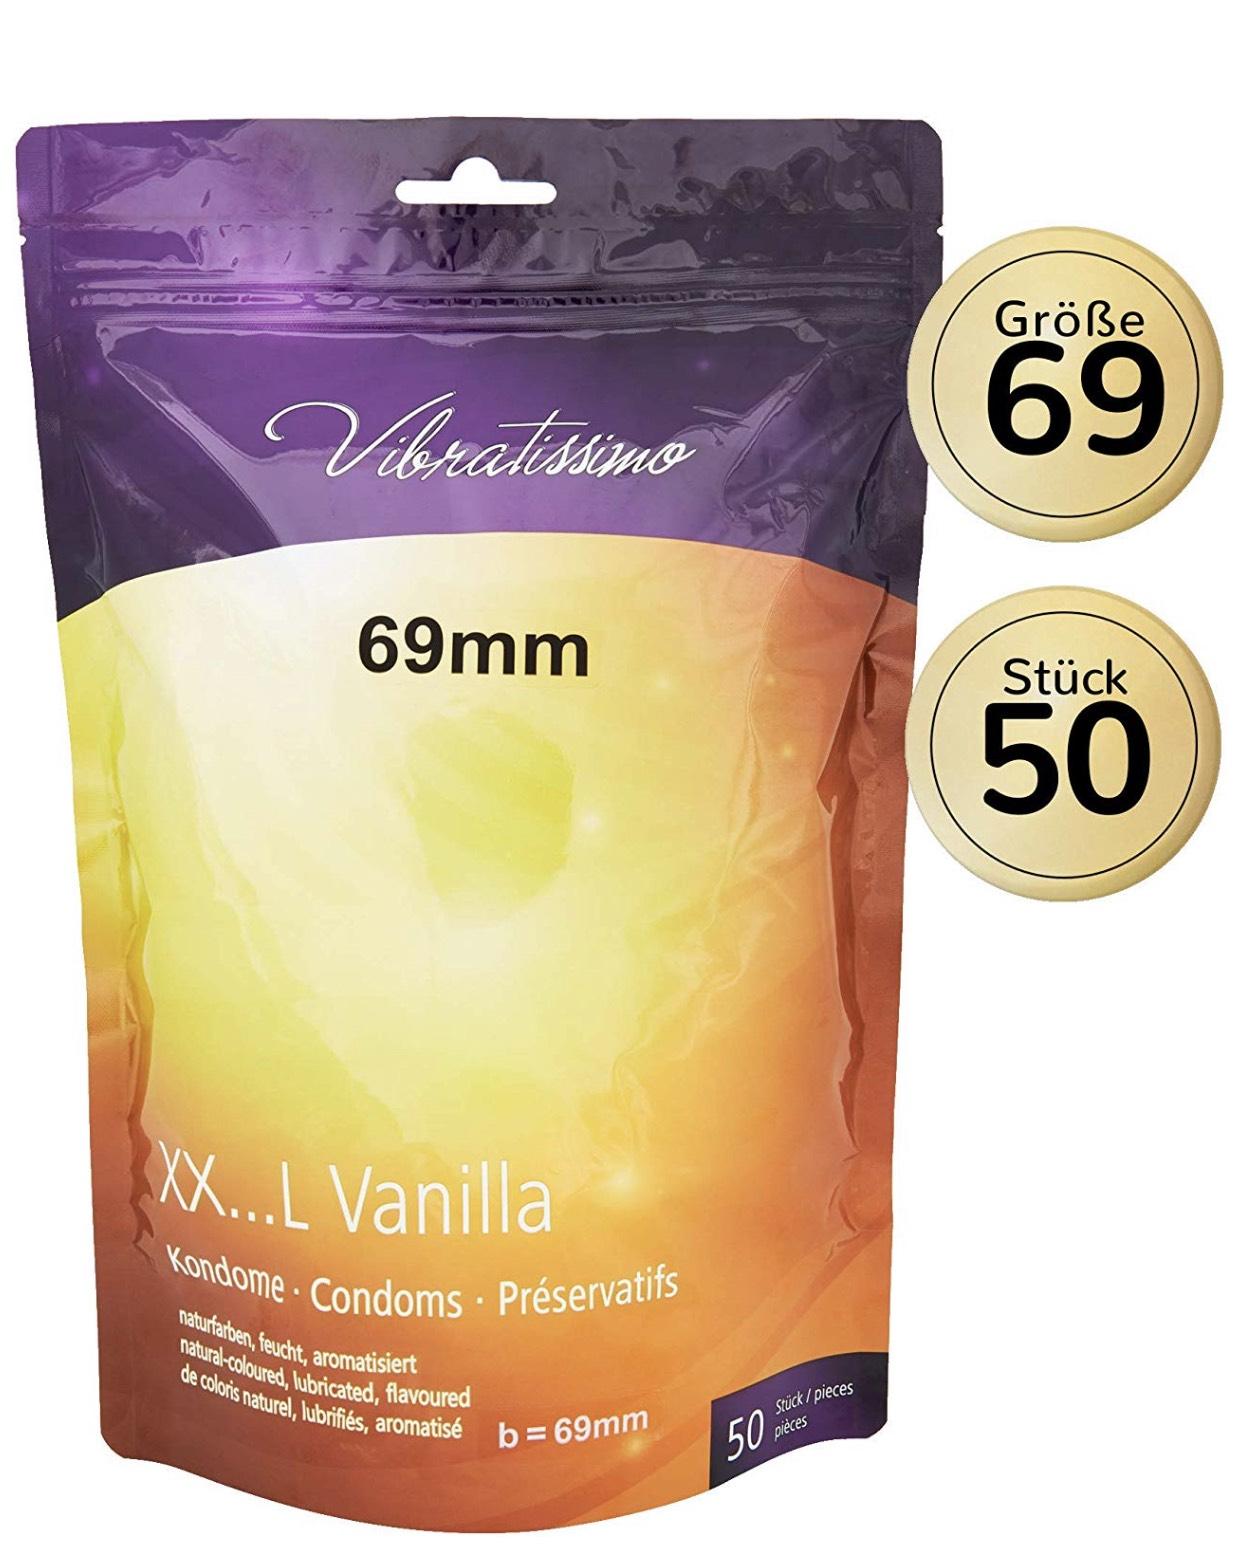 Kinderluftballons mal Anders: AMOR Vibratissimo 50er Pack Kondome in fast allen Größen